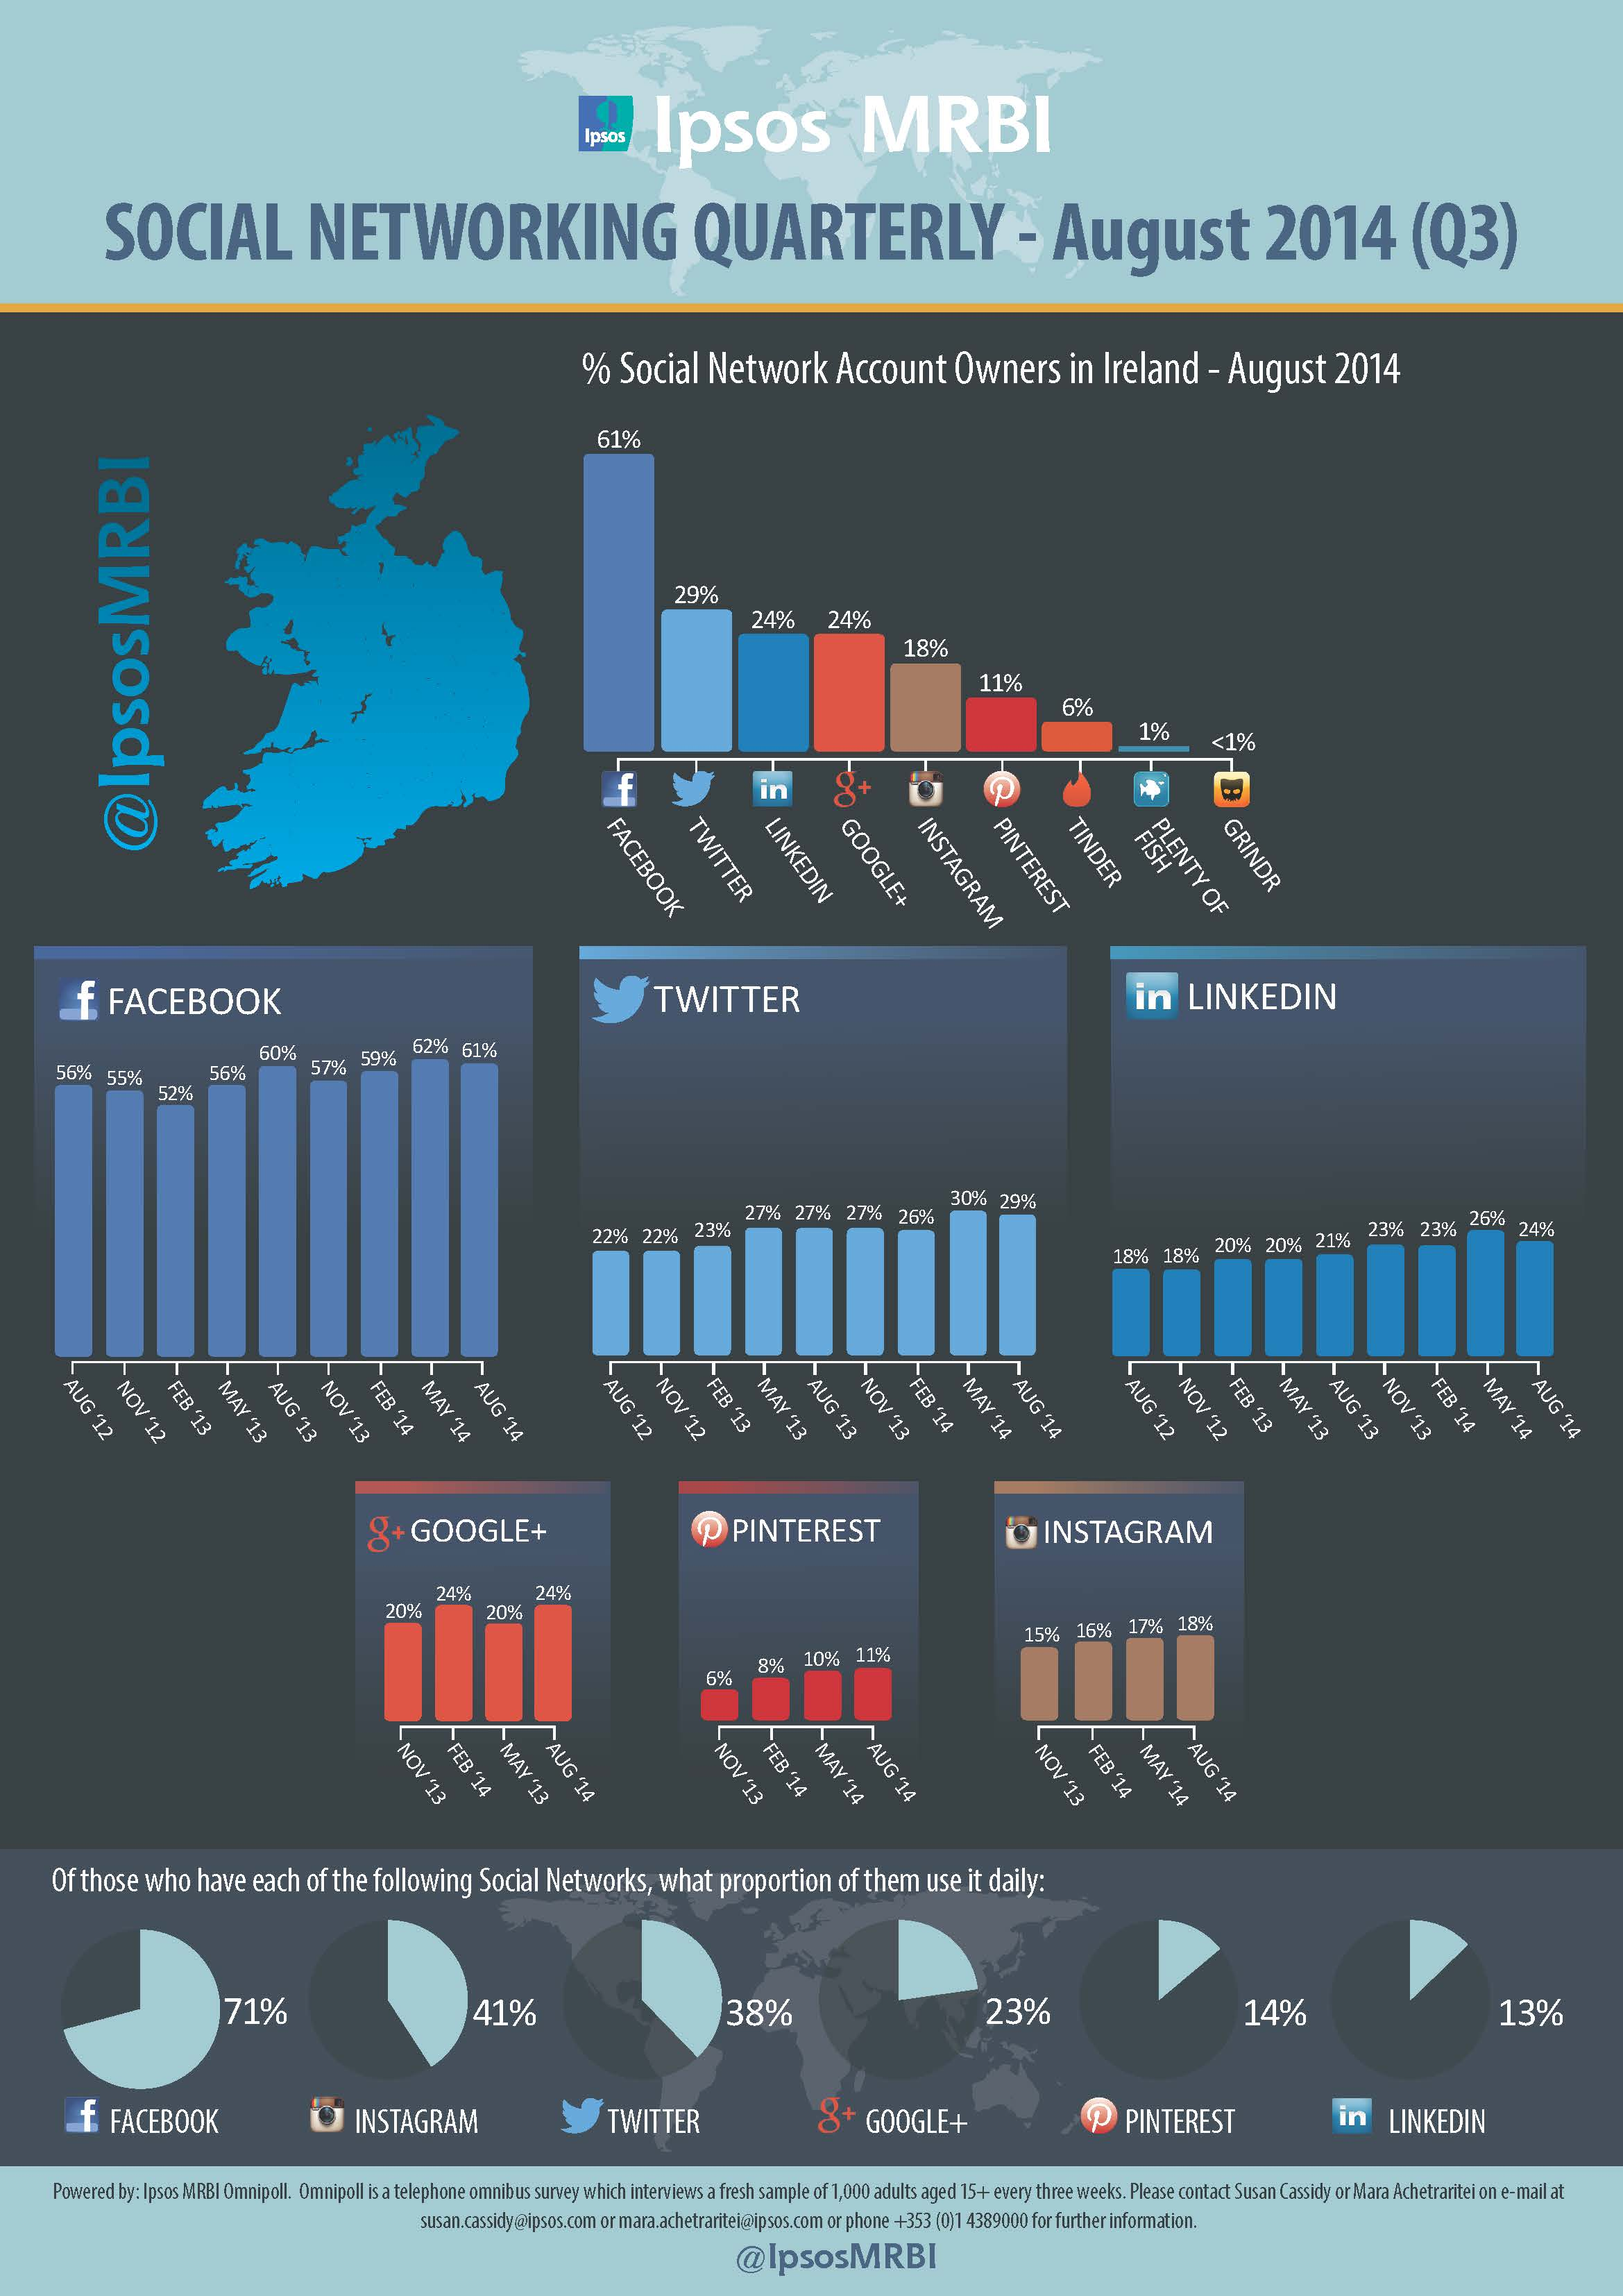 Facebook Flat but Dominant in Latest Irish Social Media Survey